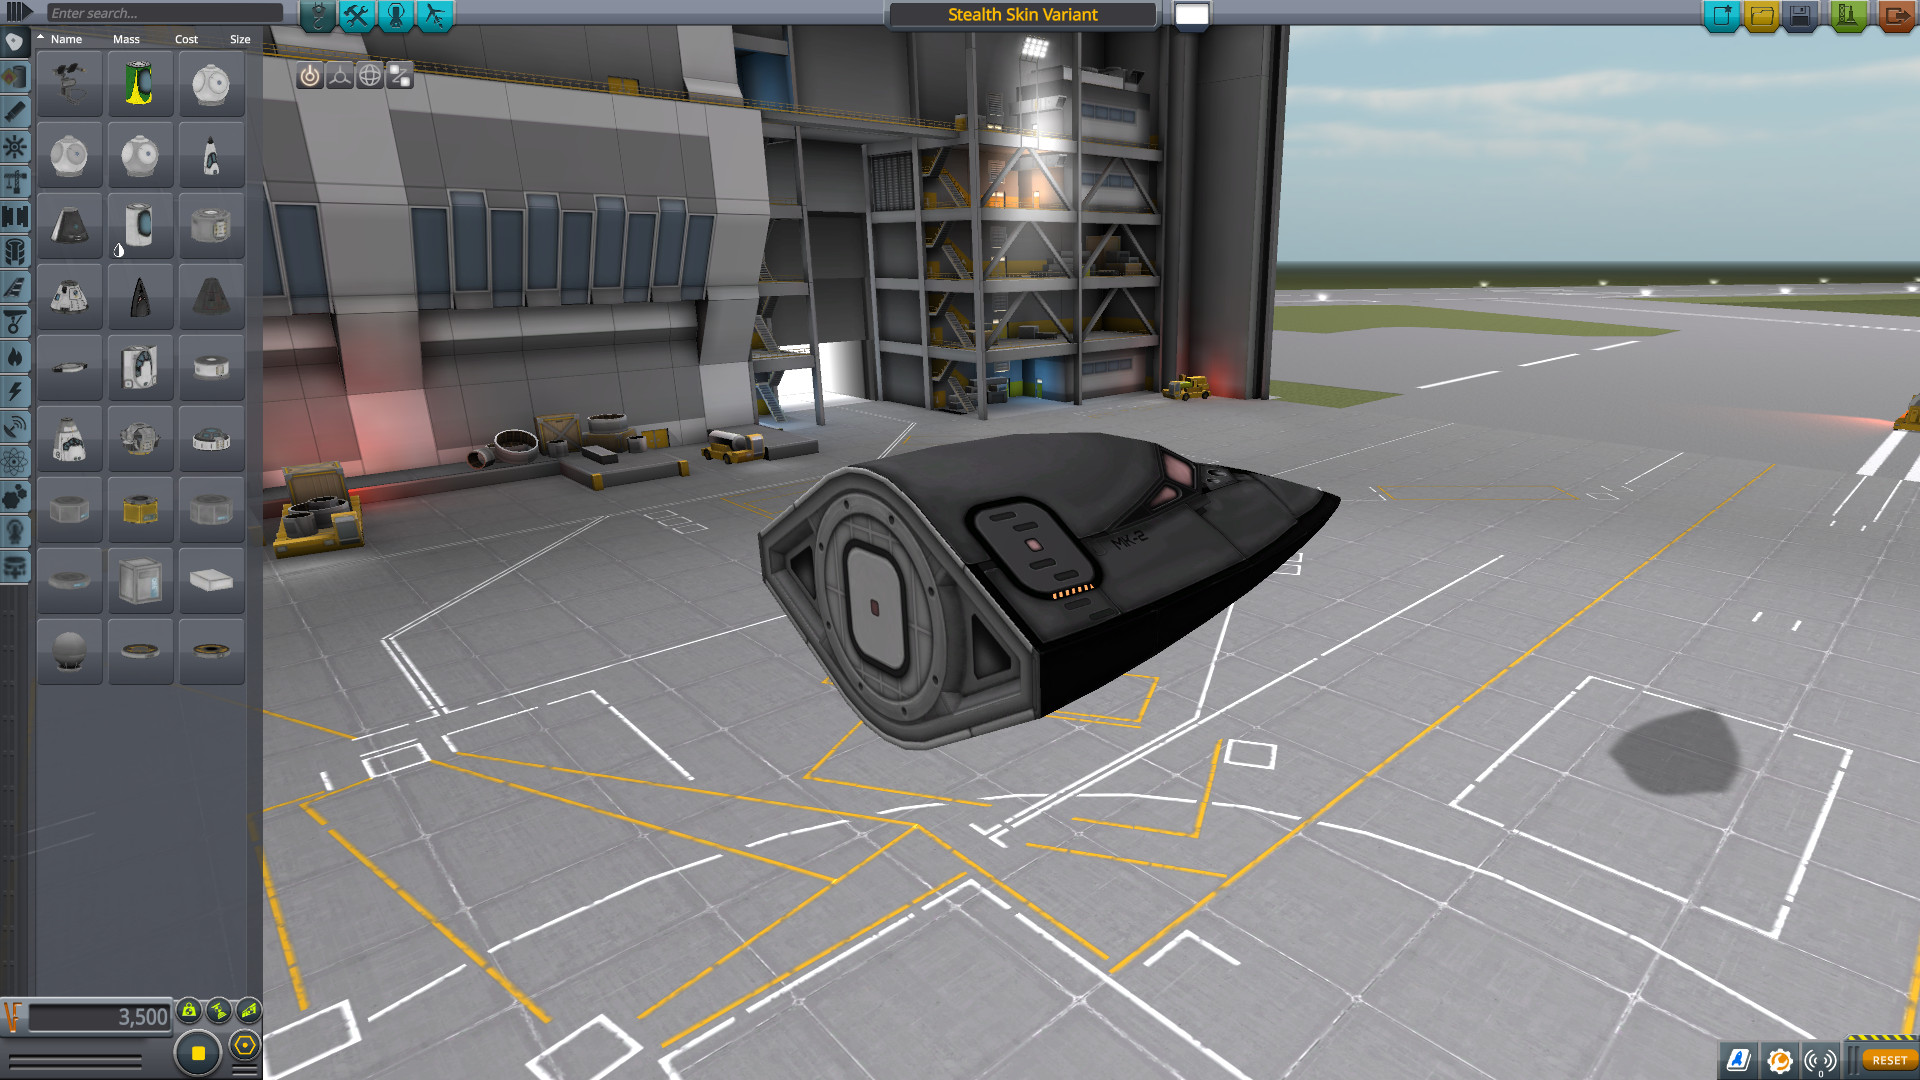 Stealth_Cockpit_2.jpg